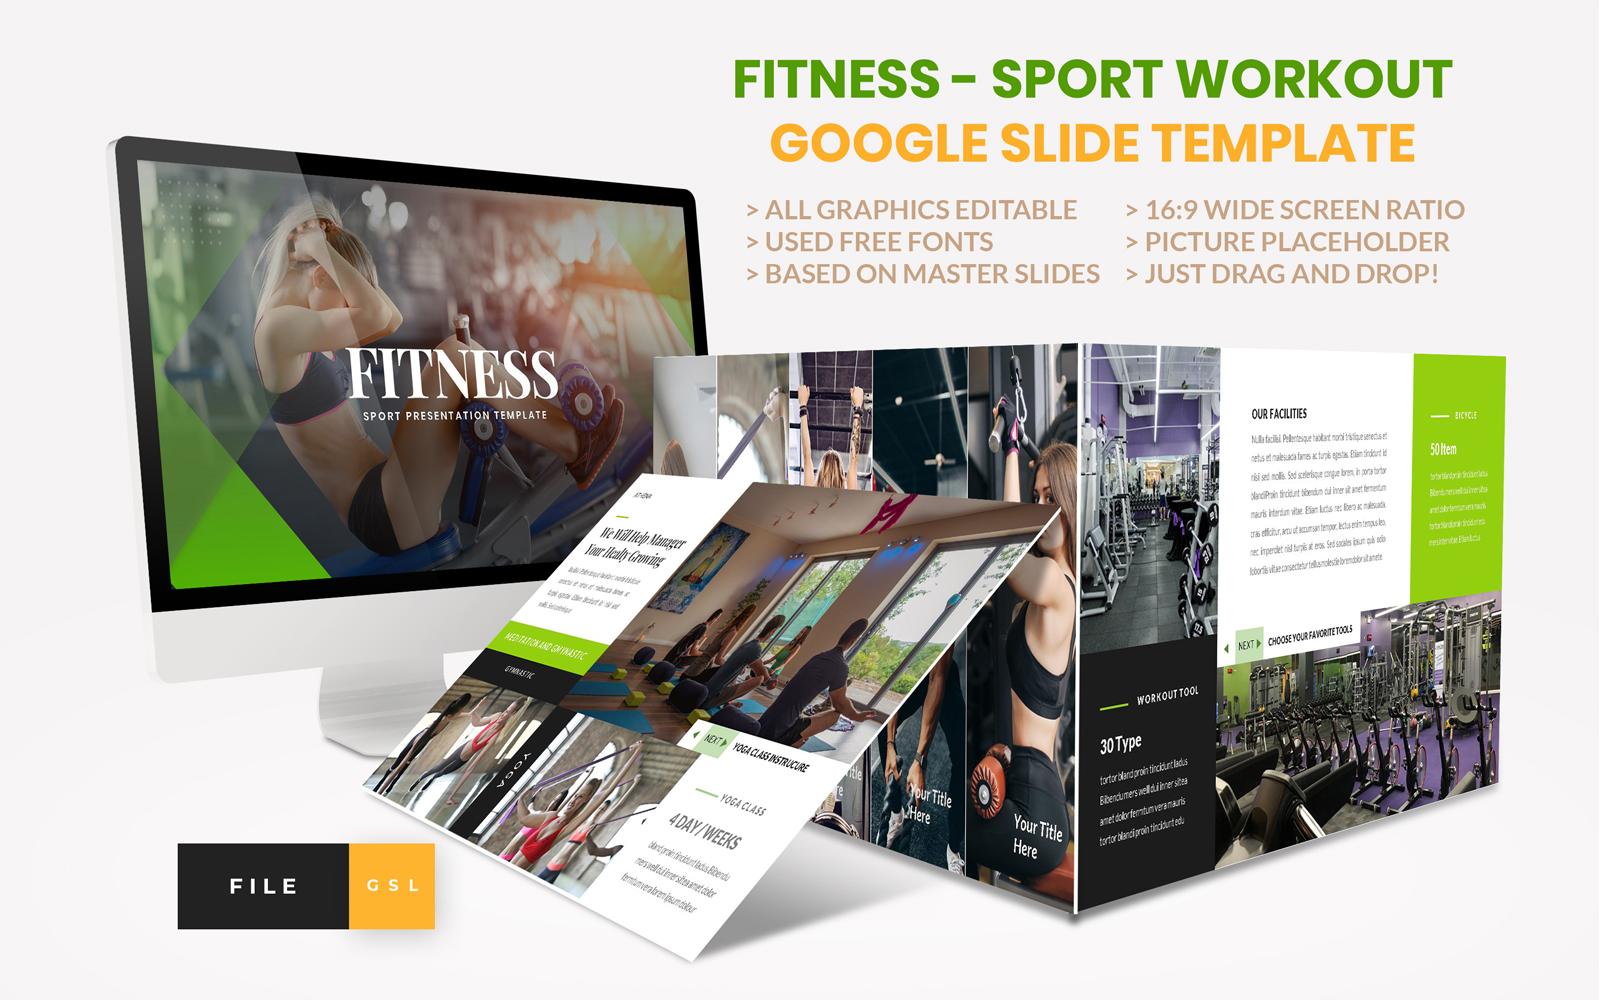 Sport - Fitness Business Workout Google Slides